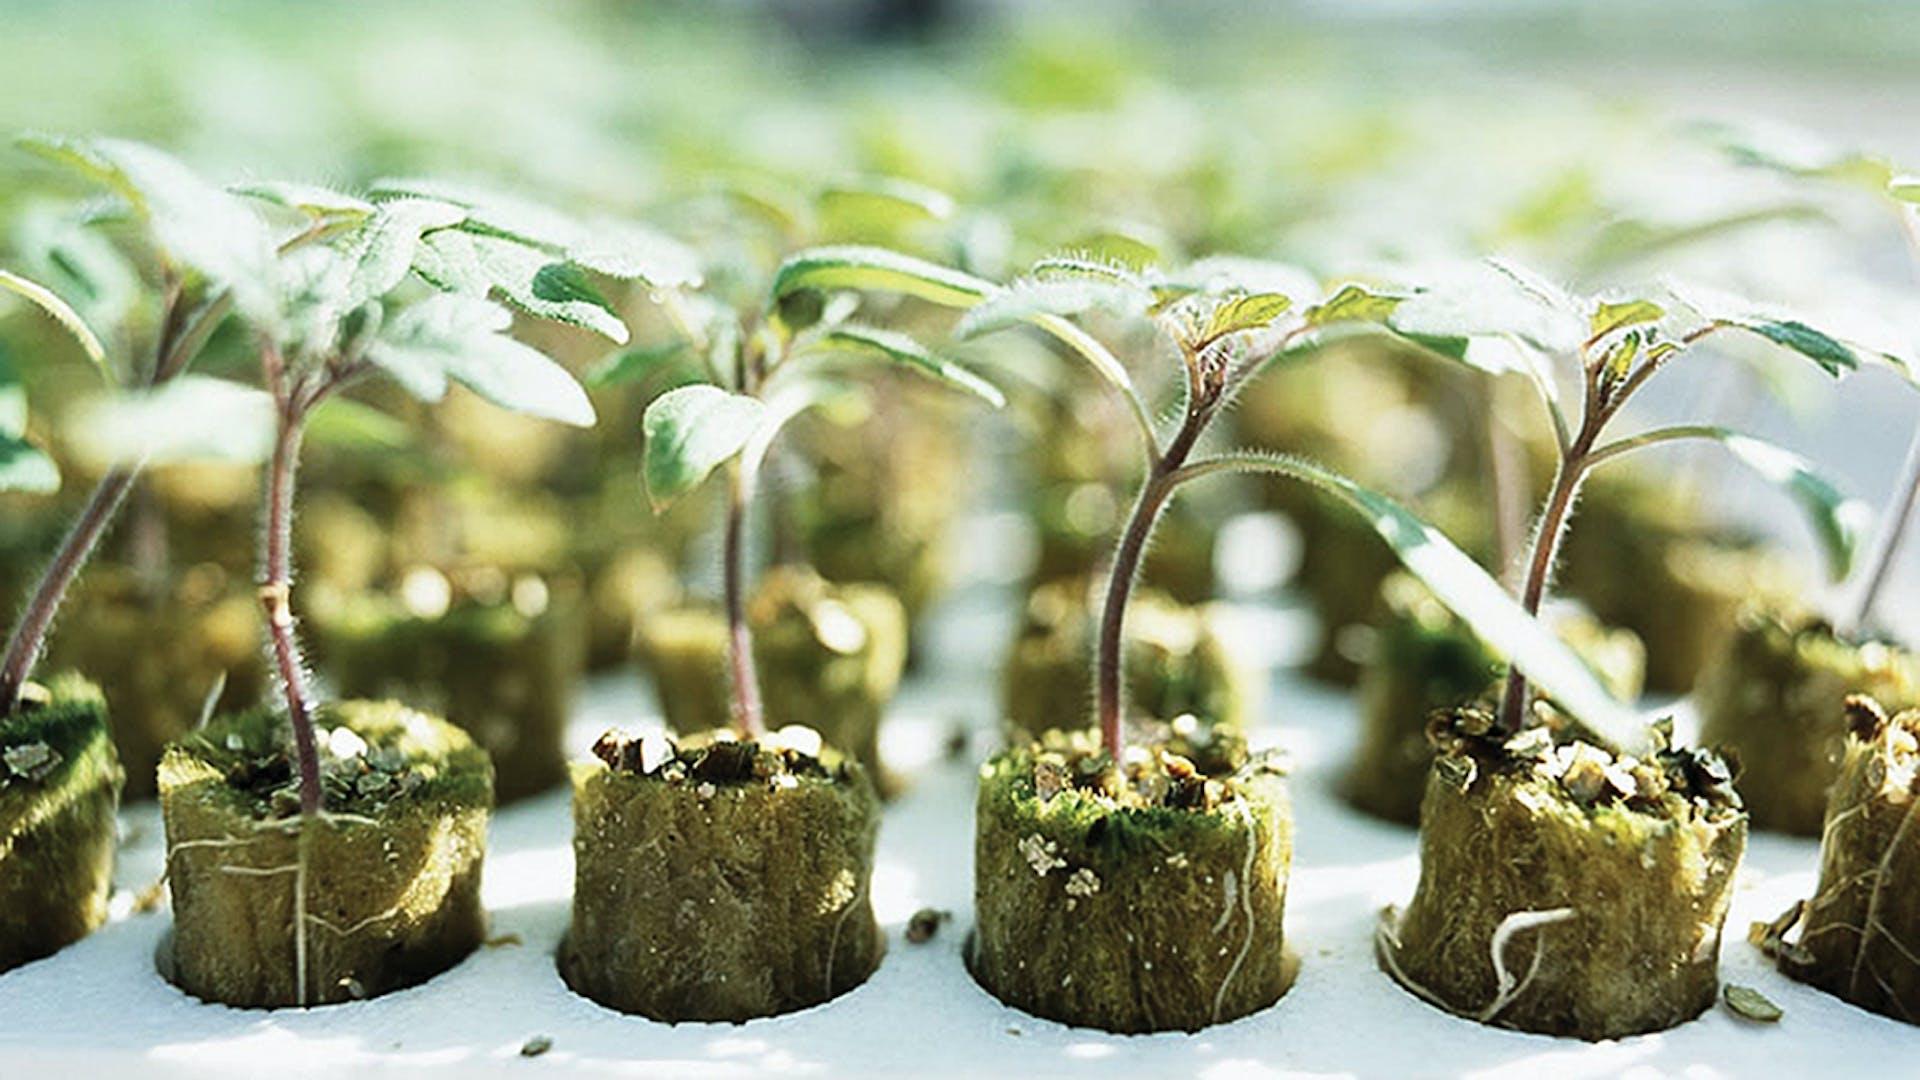 Propagation Solutions, growth, quality, innovative, development, Young plants, Grodan Groplugs